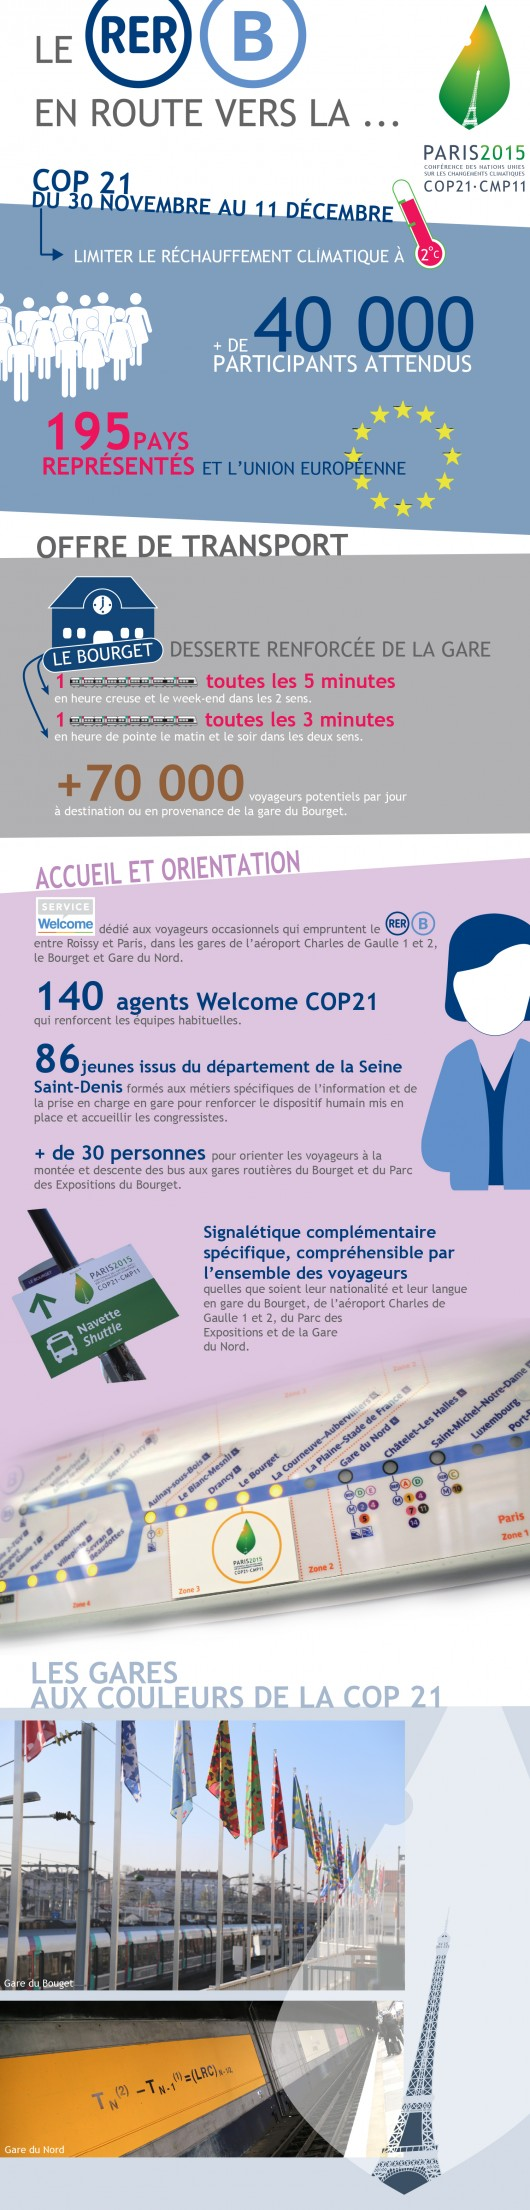 blog_rerb_cop21_infographie